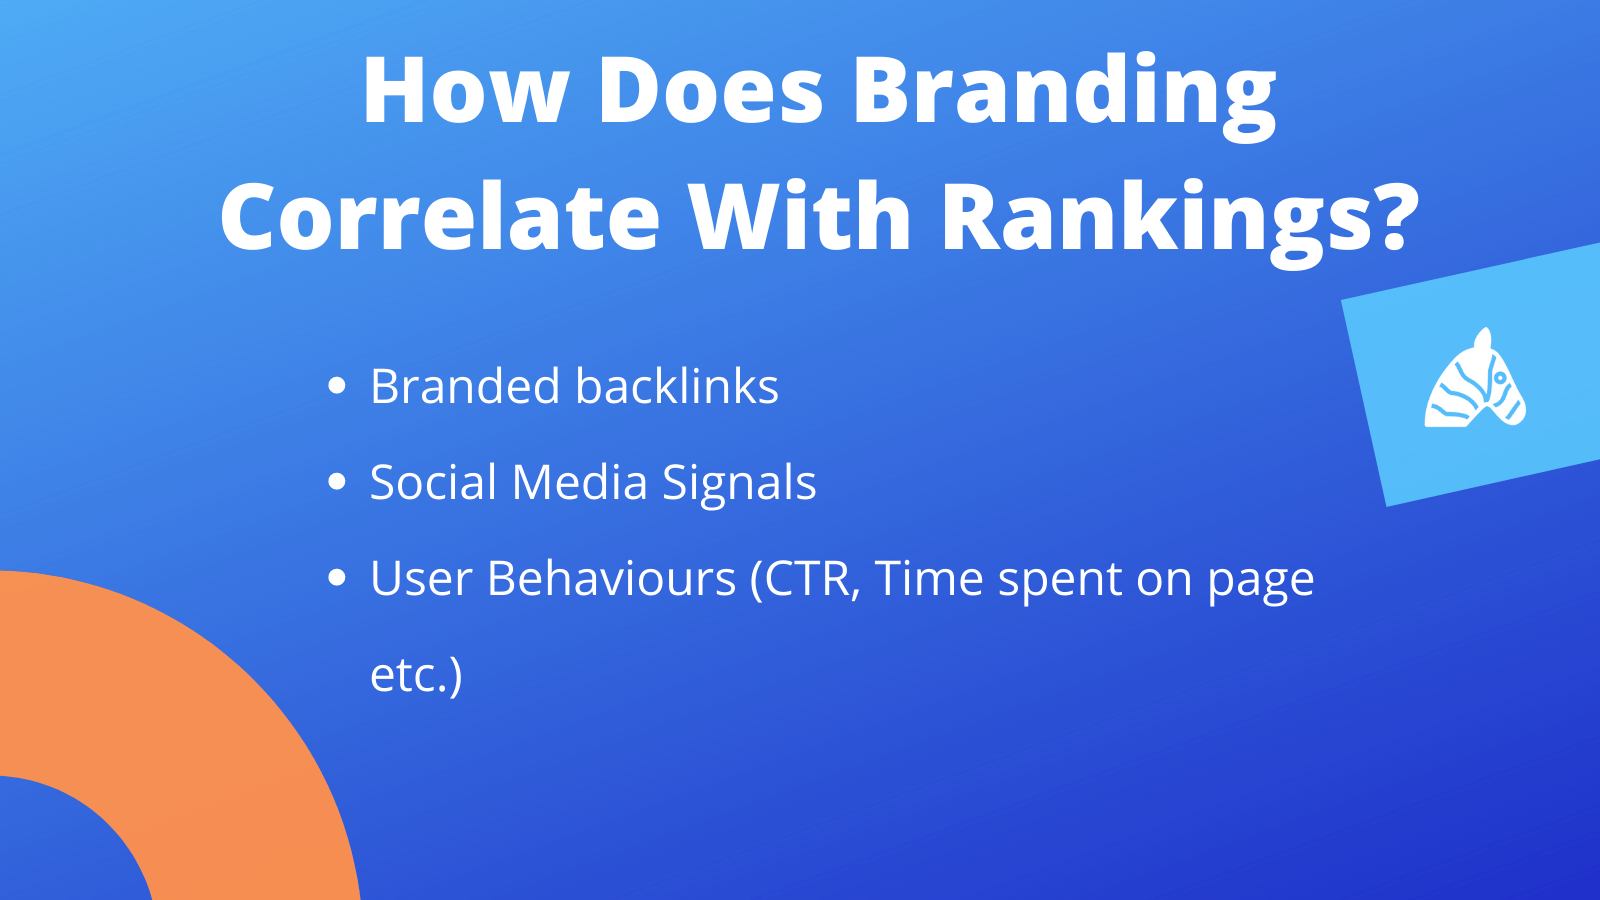 how do SEO rankings correlate with branding